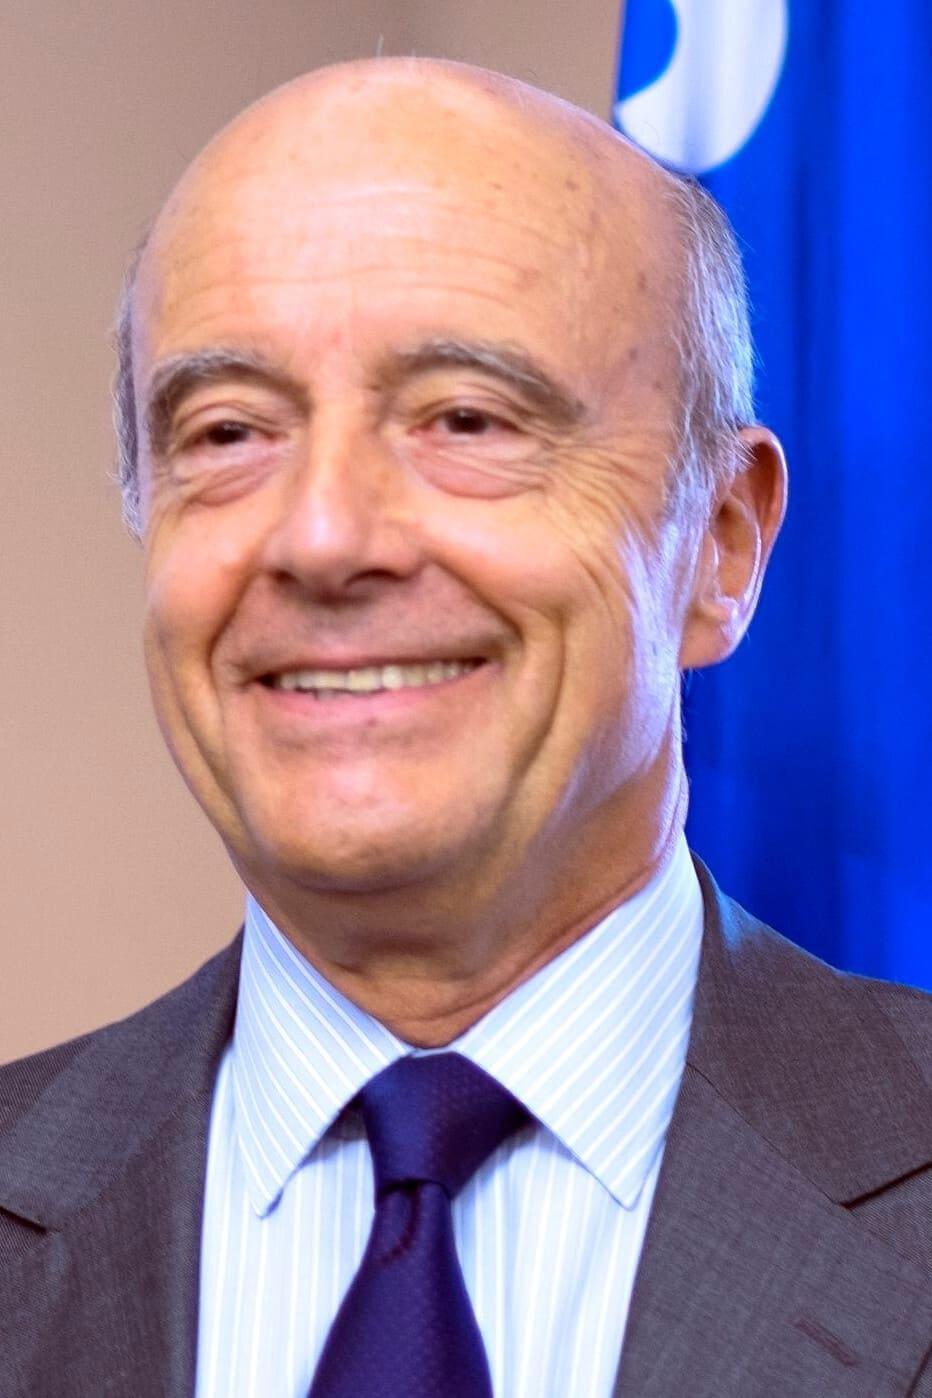 Alain Juppé